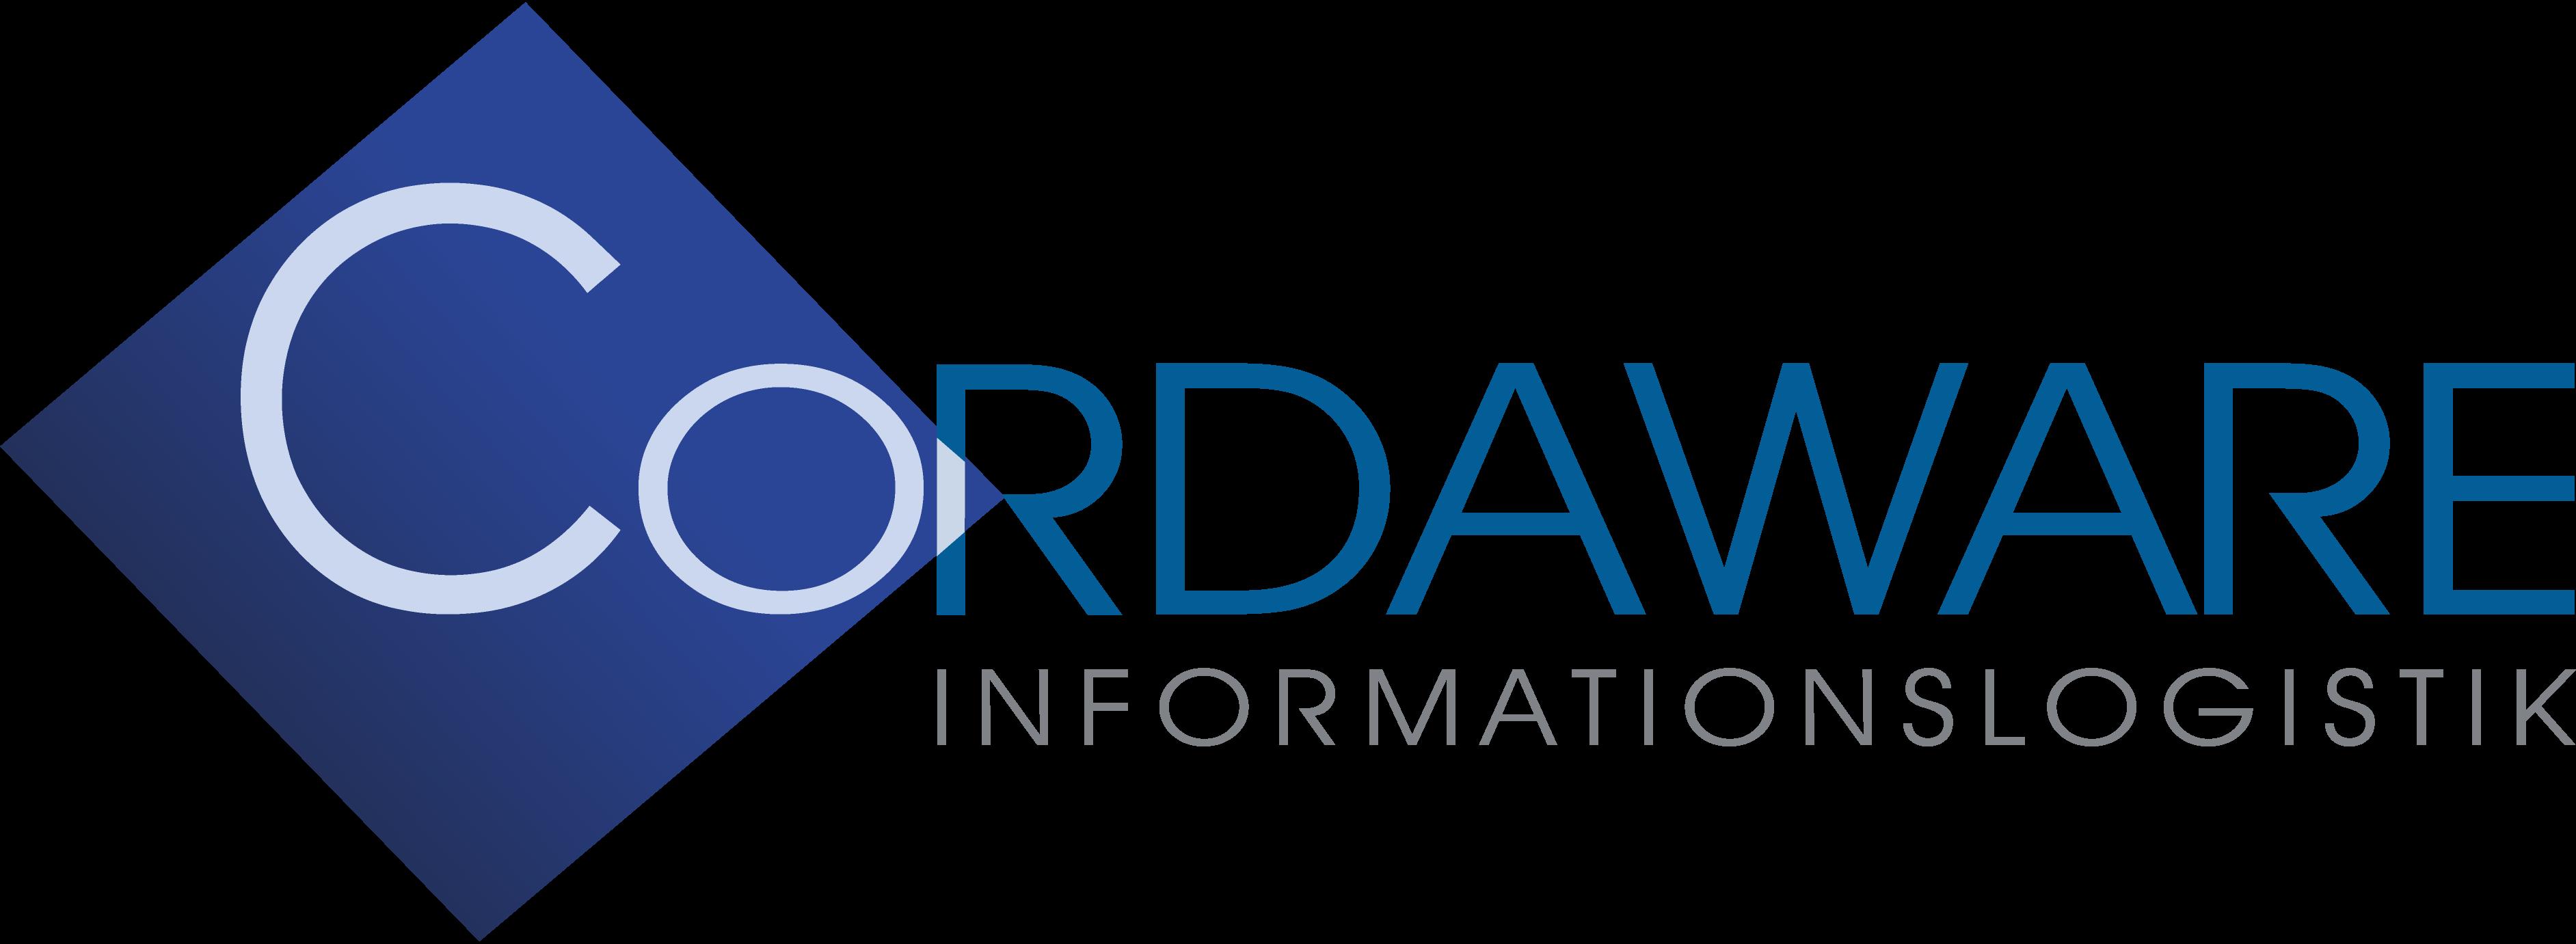 Cordaware GmbH Informationslogistik logo